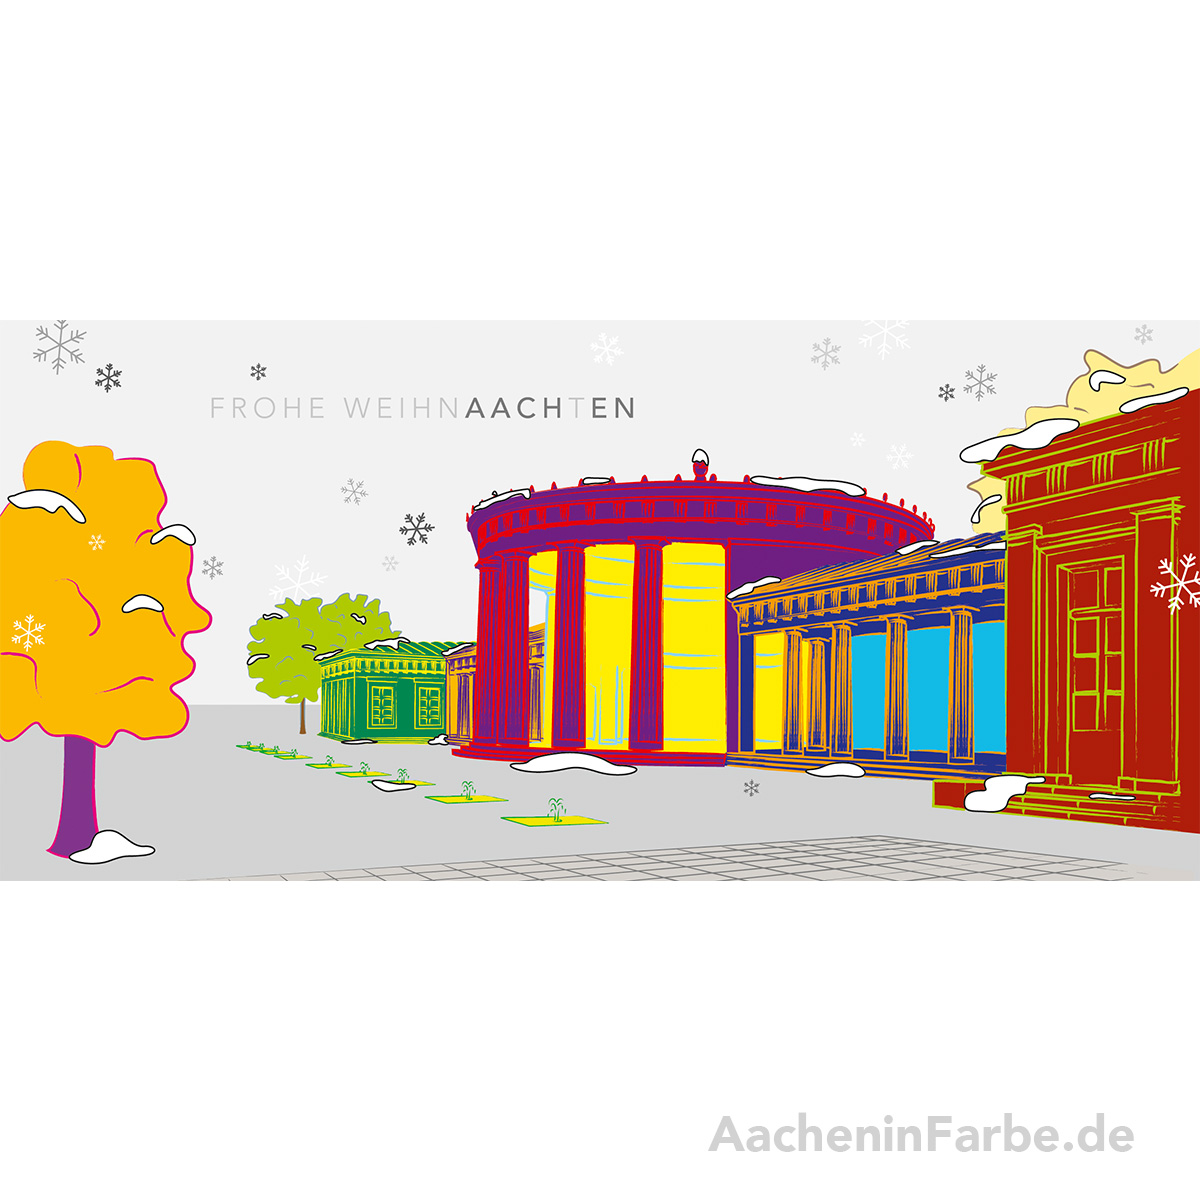 "Grußkarte ""Frohe WeihnAACHtEN"", Elisenbrunnen, bunt (Silber)"